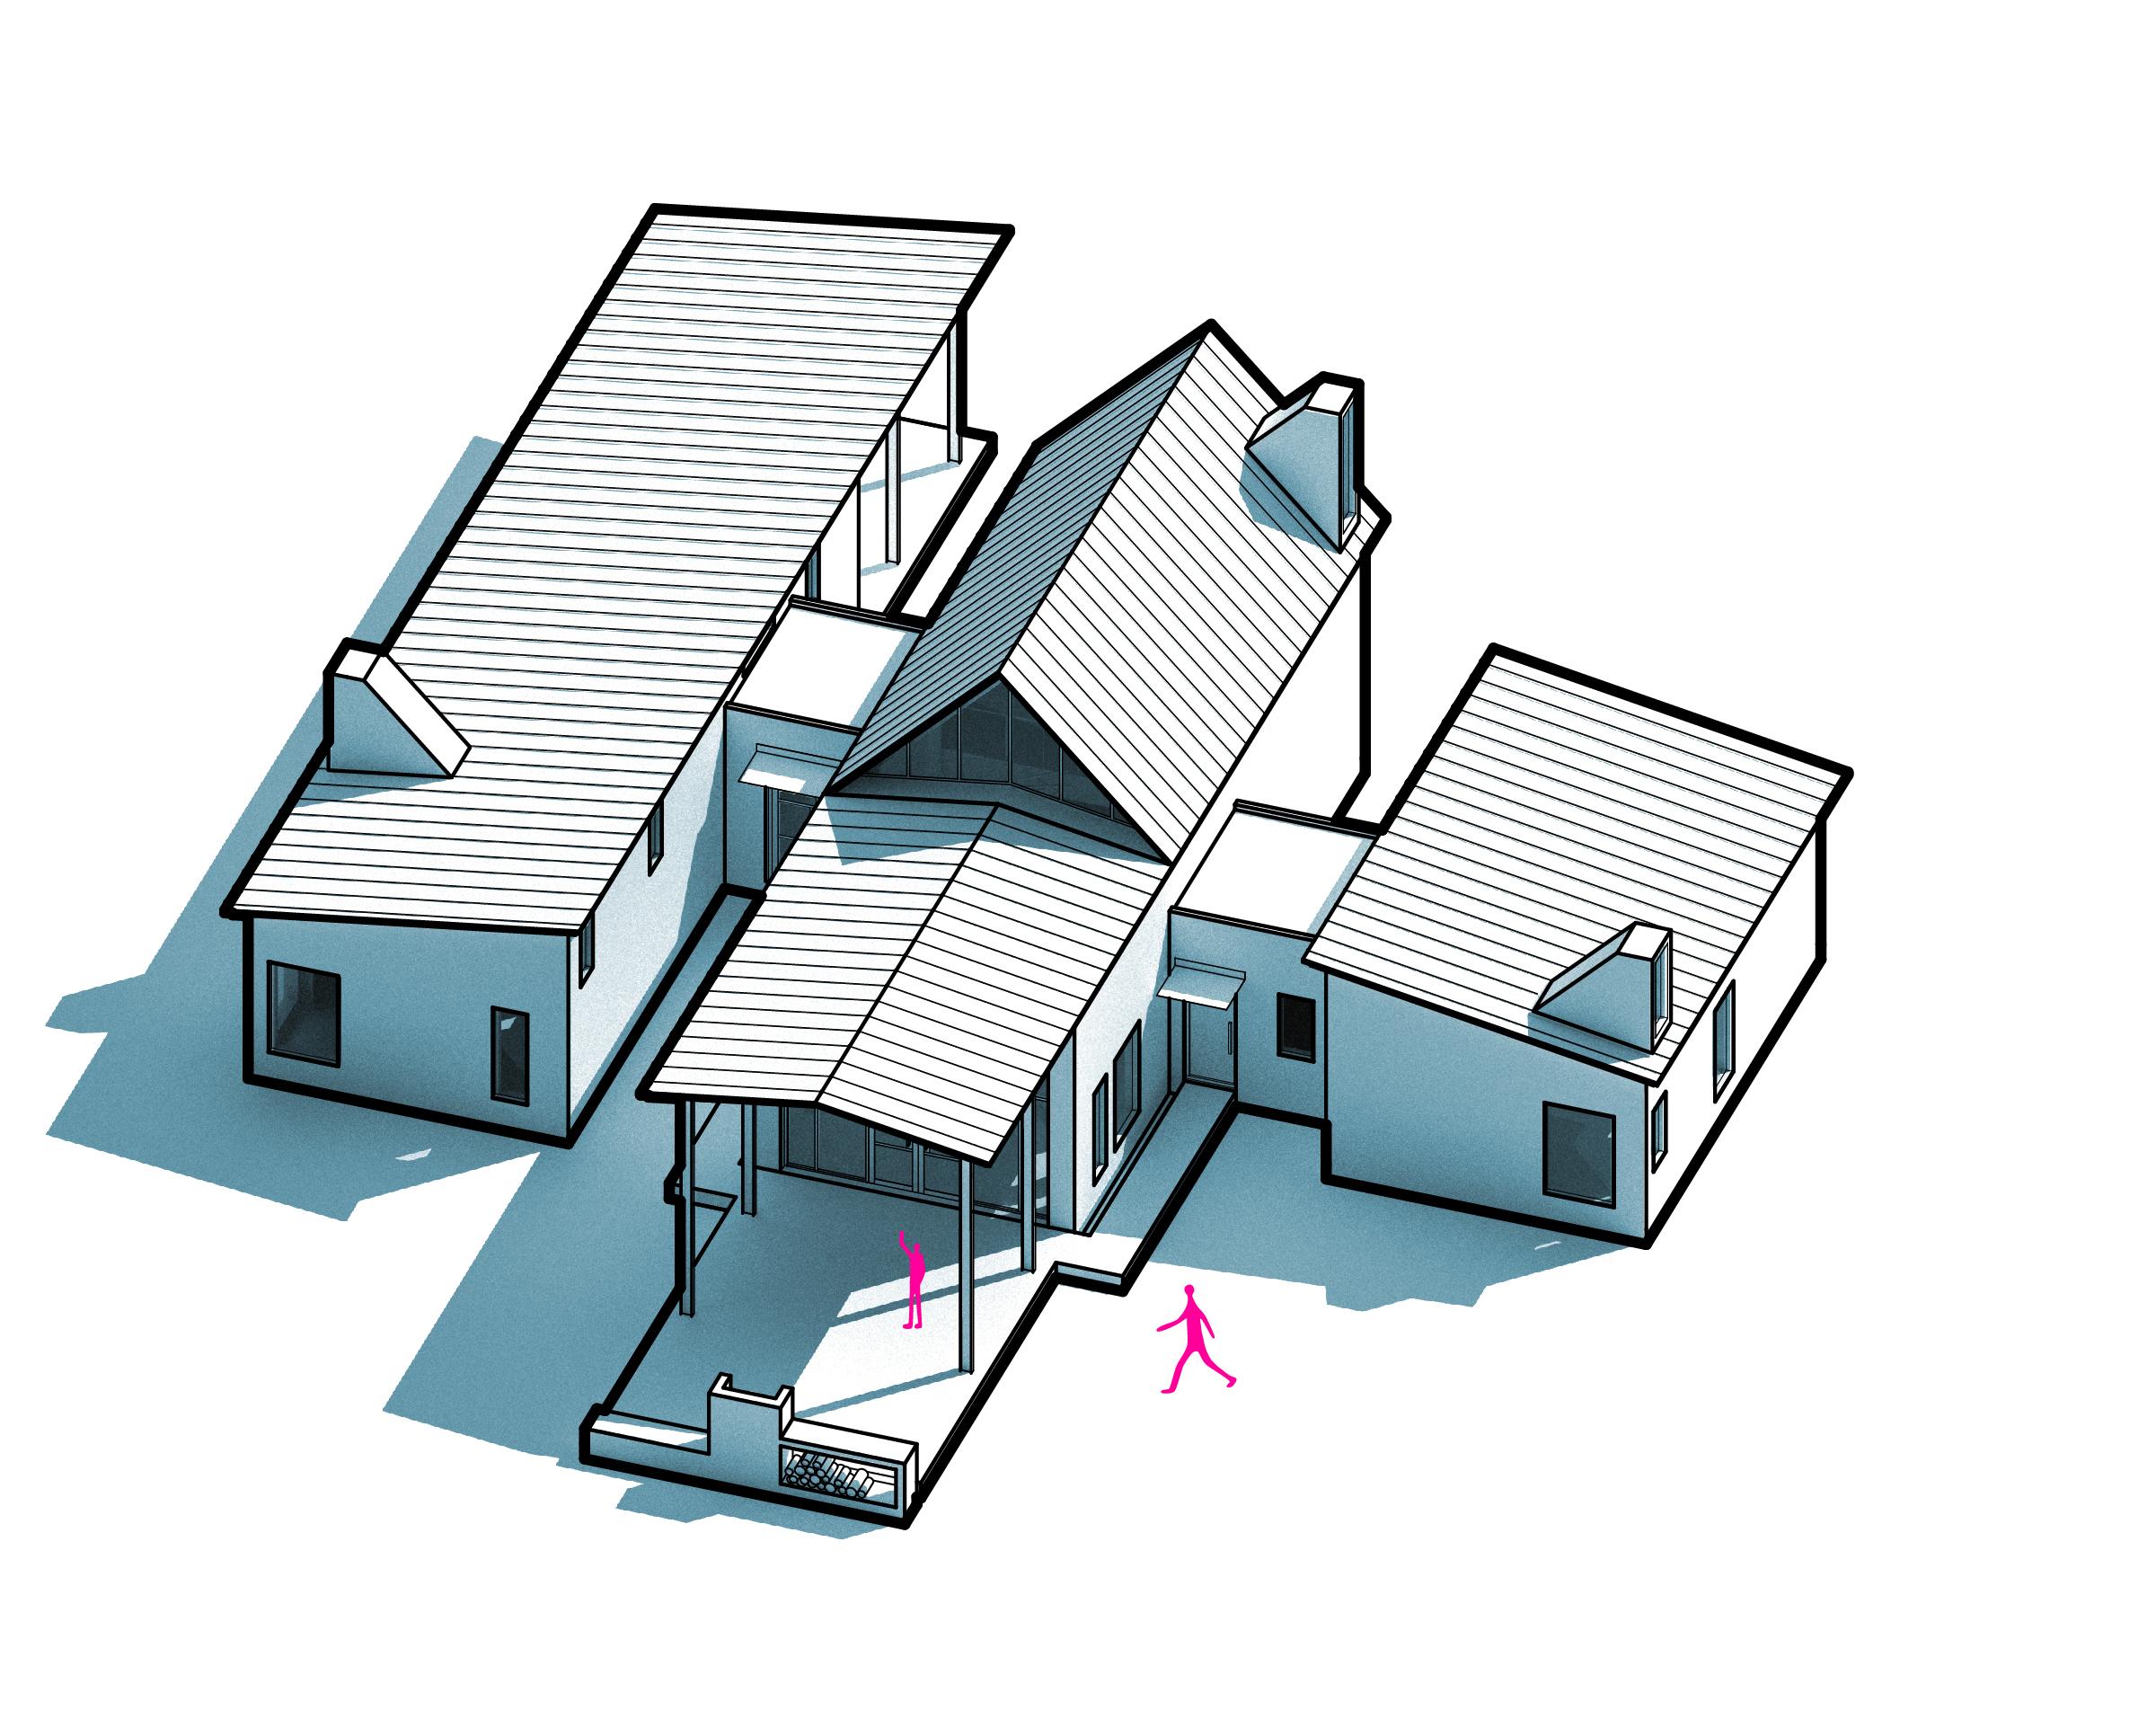 R_House Process Axon-08.jpg